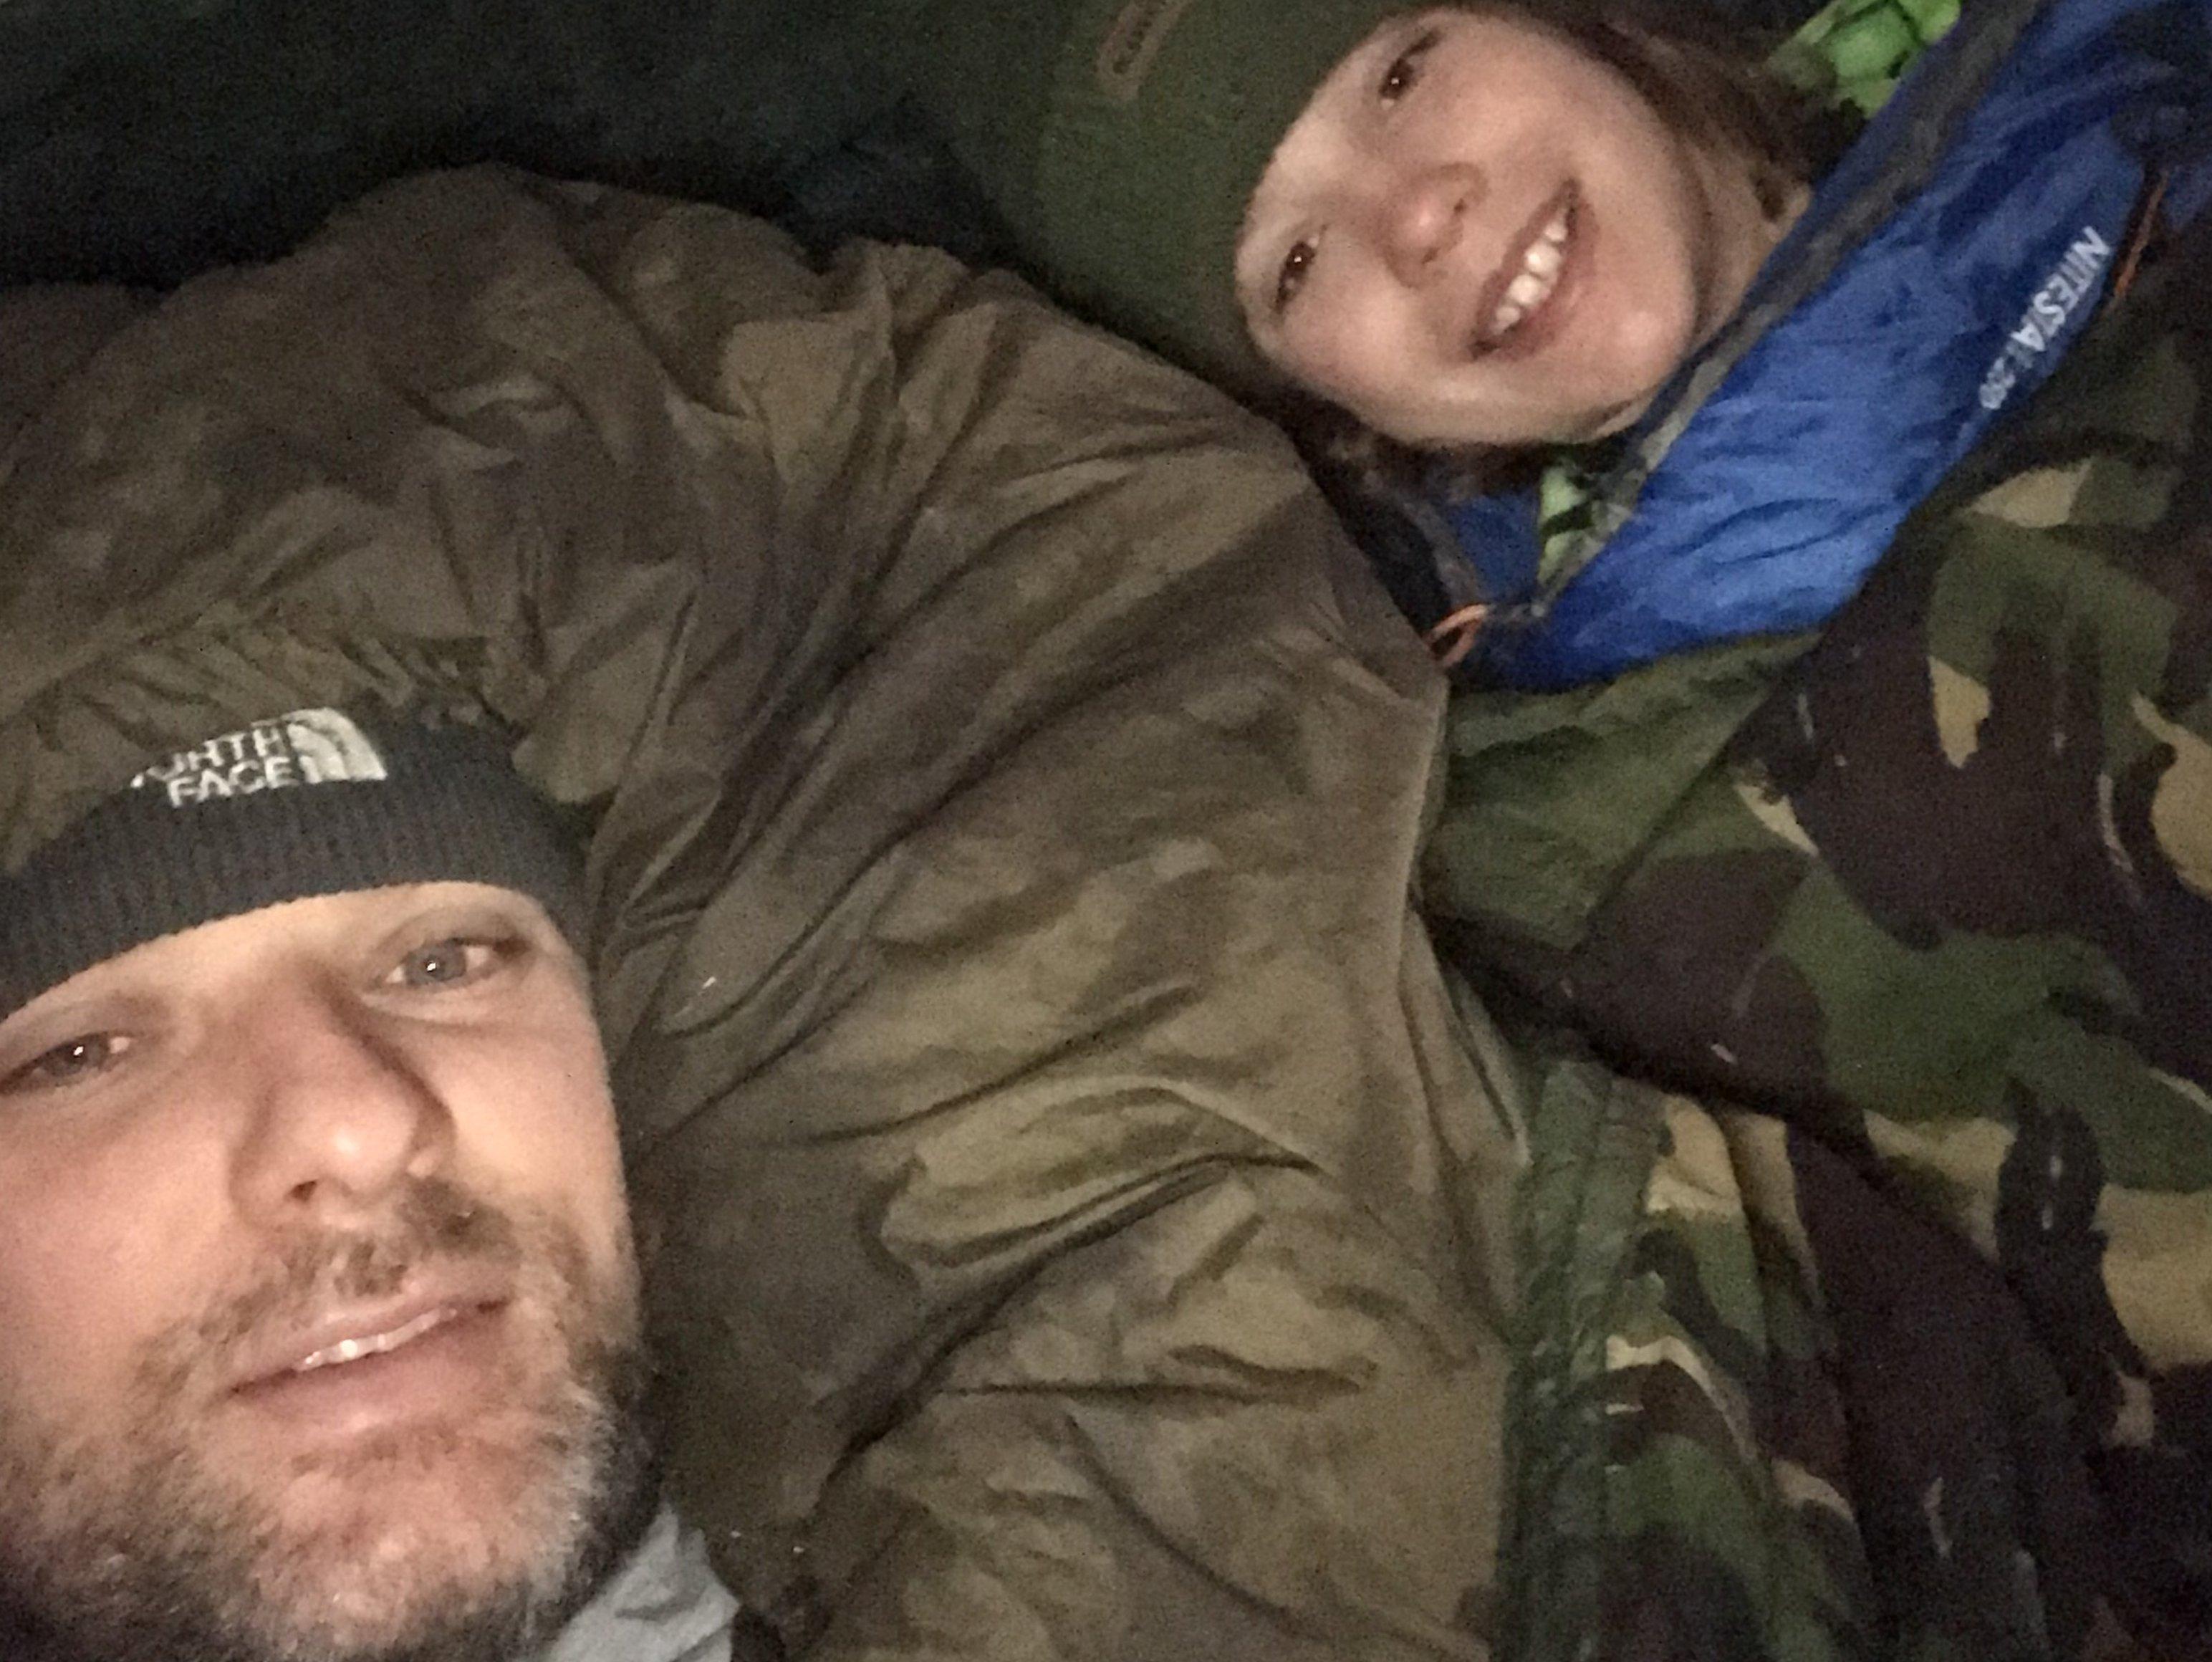 Alex Asbridge and his son Jesse